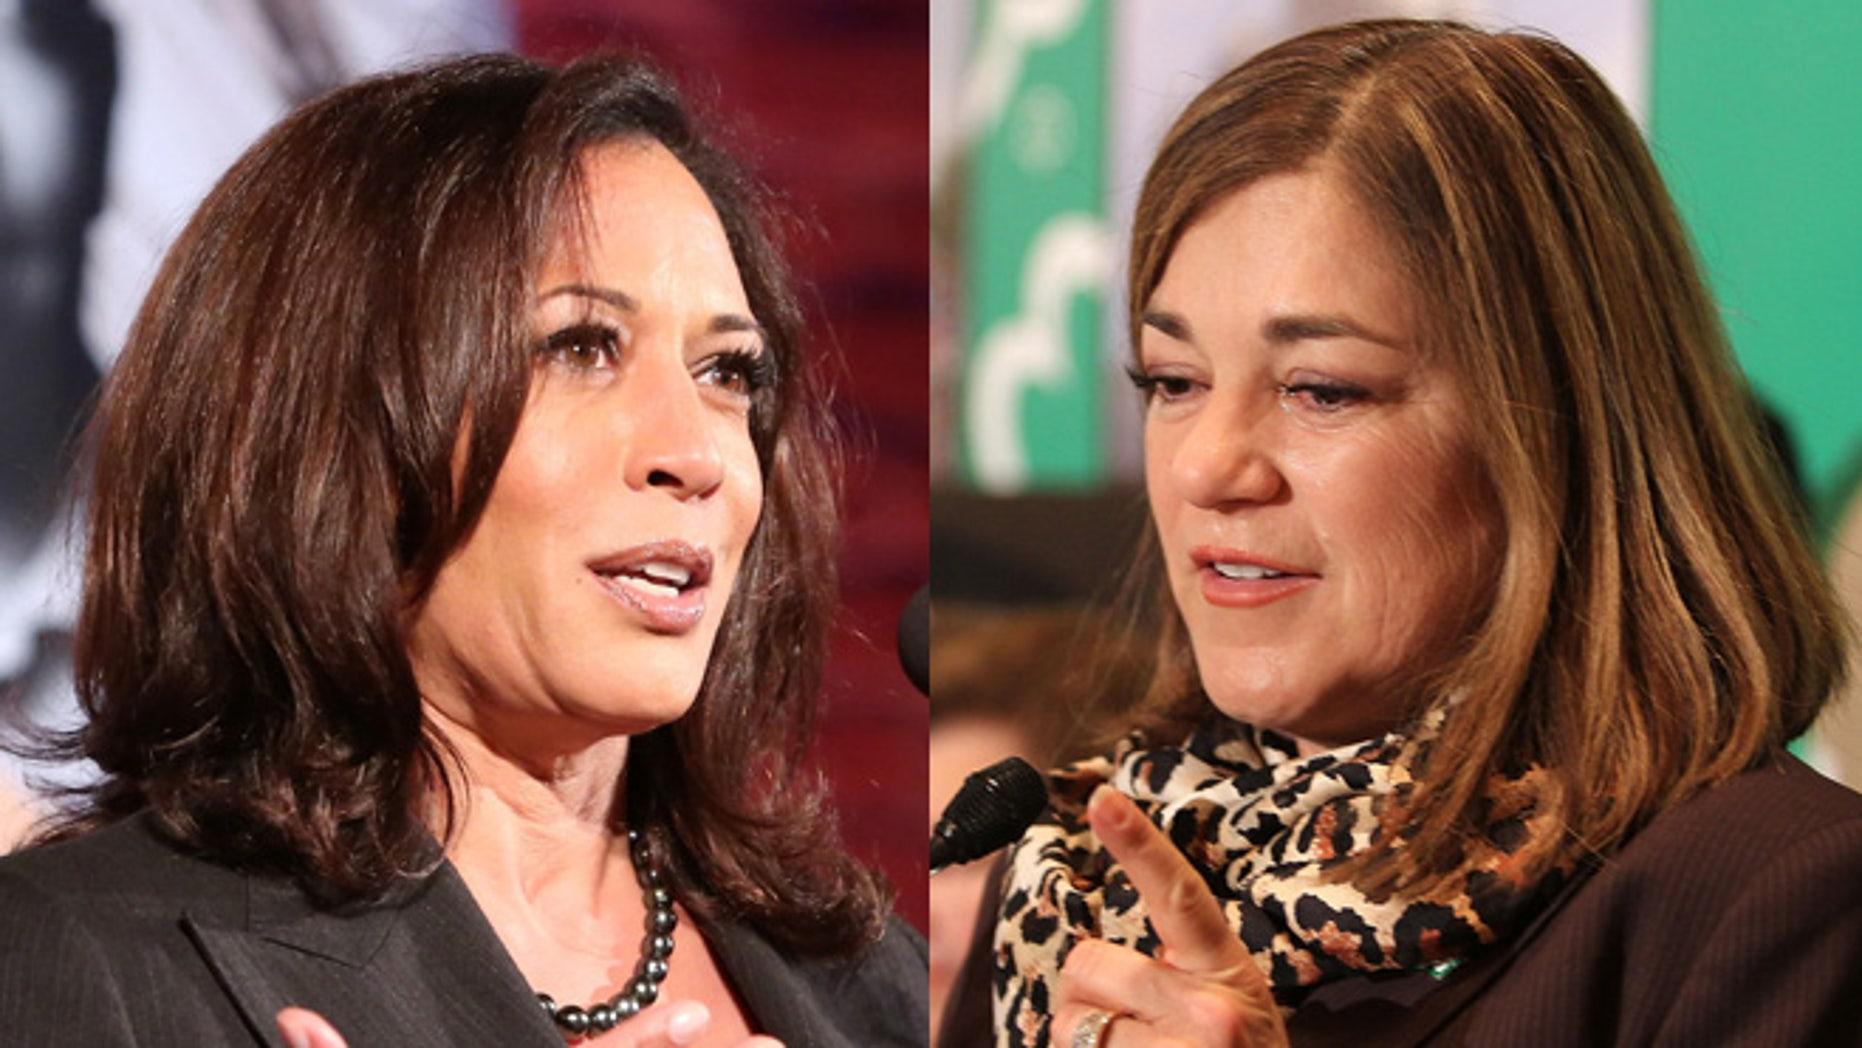 California Attorney General Kamala Harris, left; Rep. Loretta Sanchez, right.